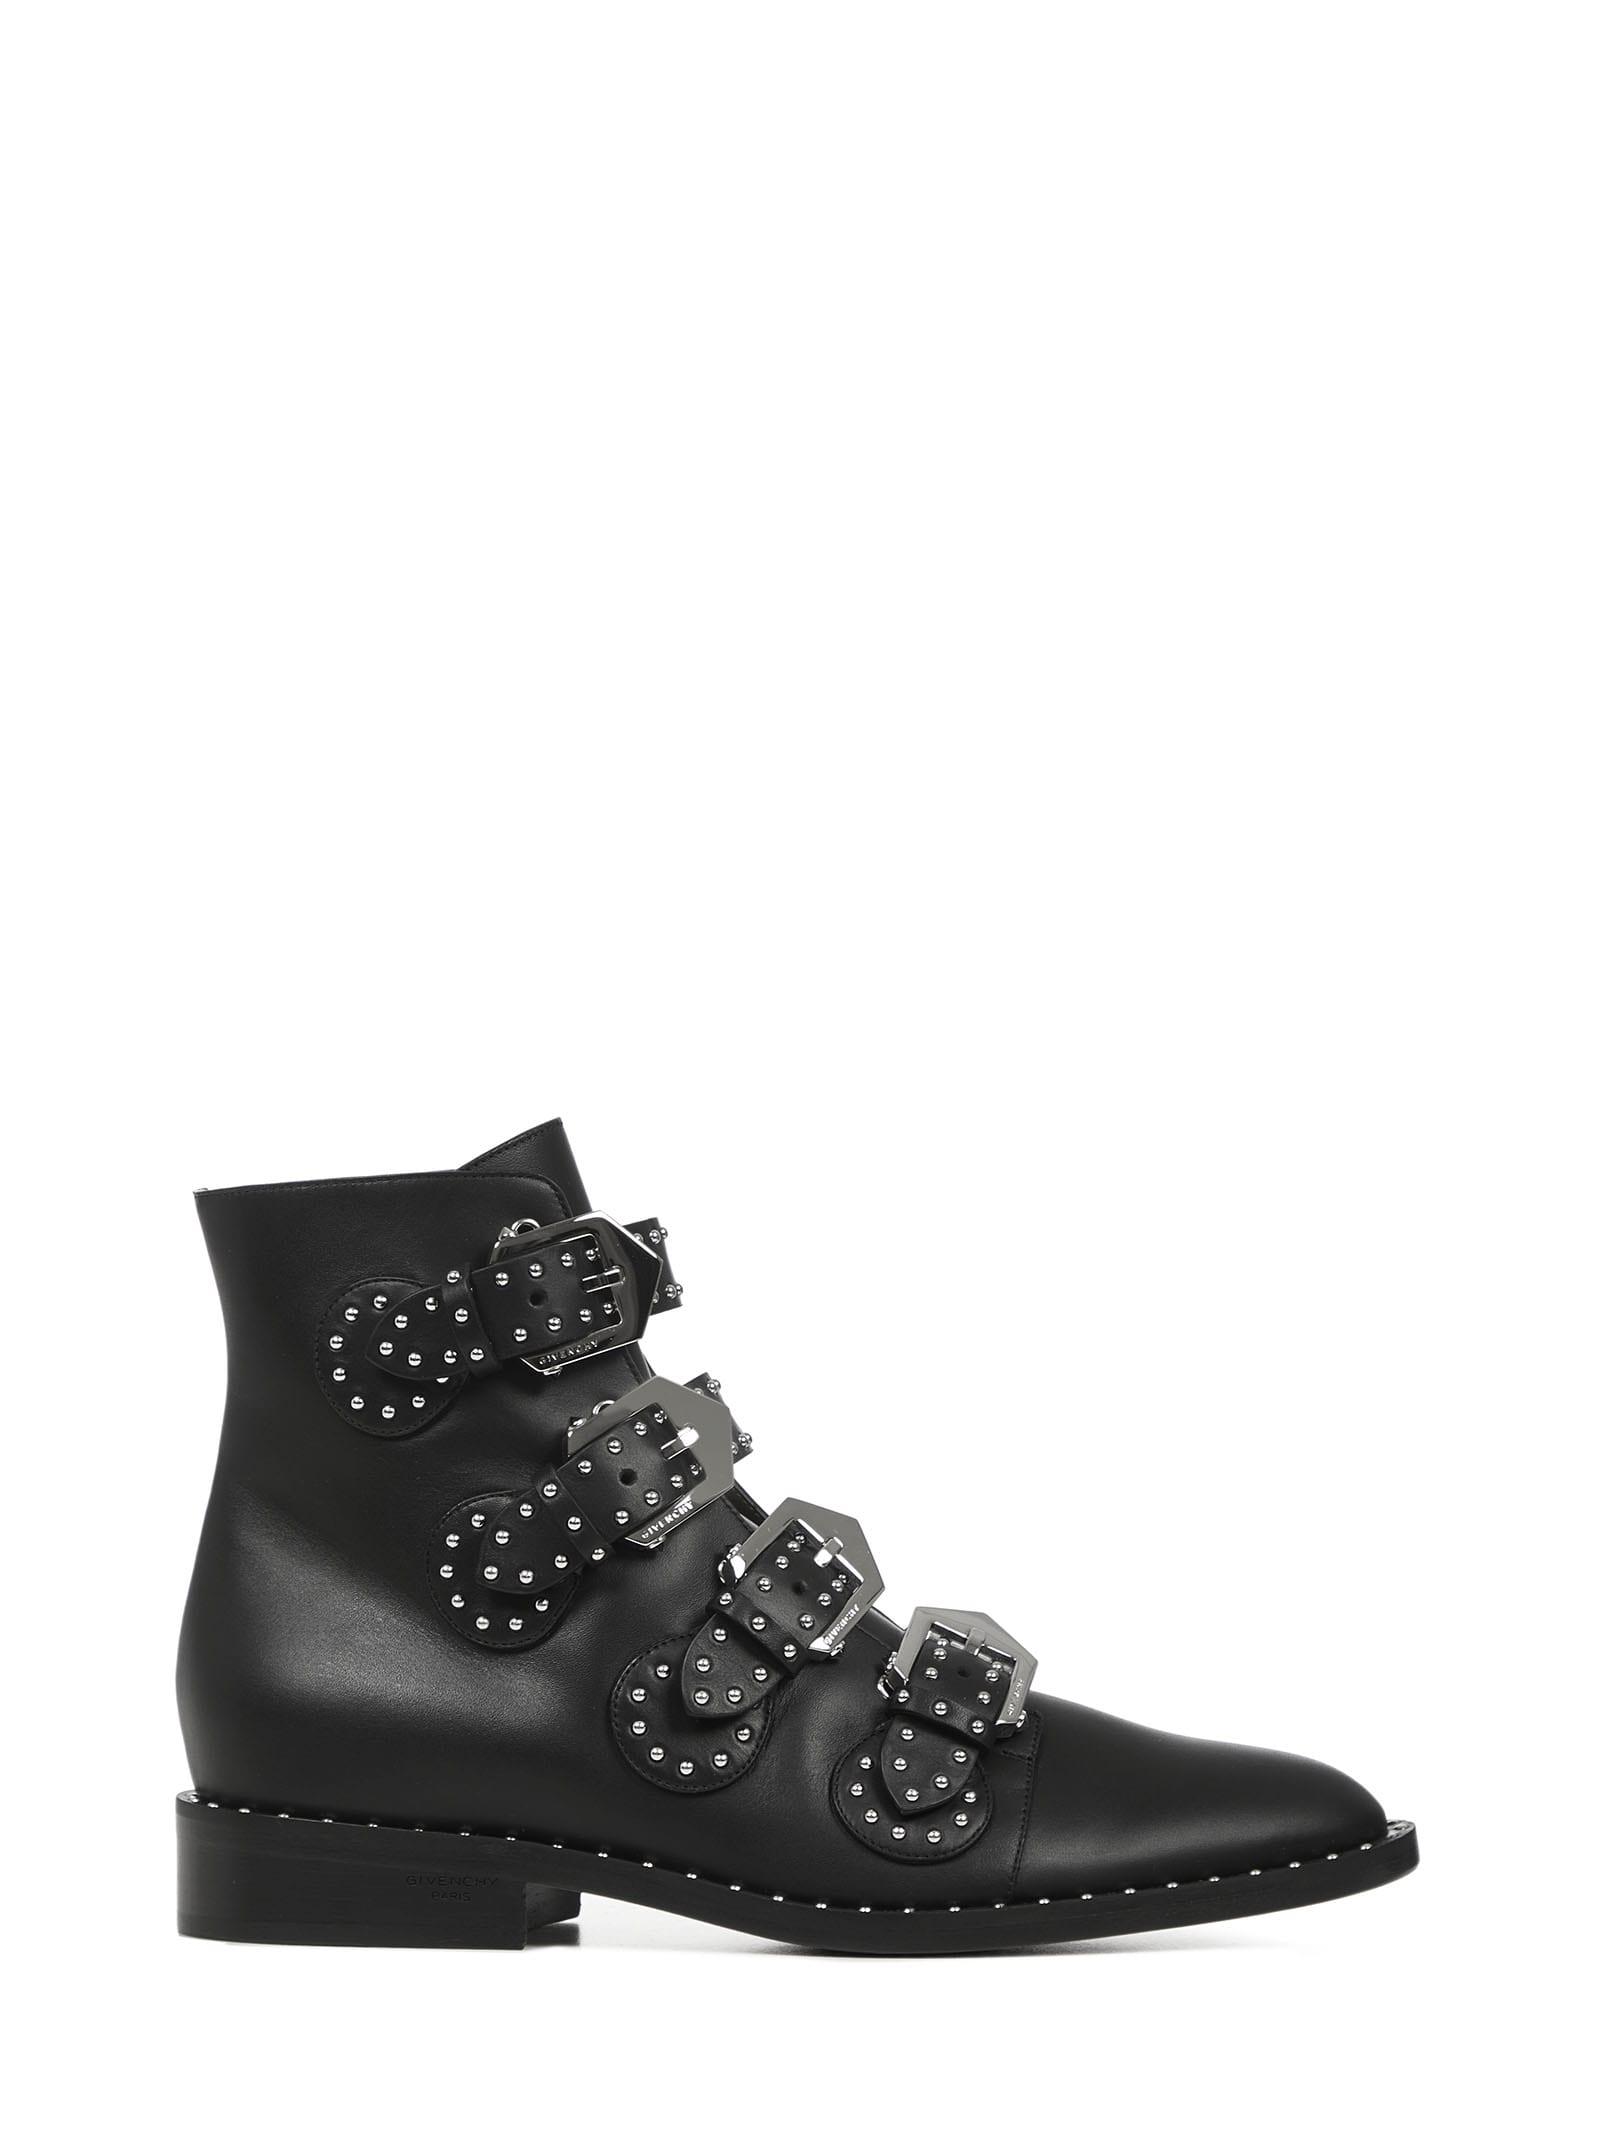 Givenchy Elegant Boots